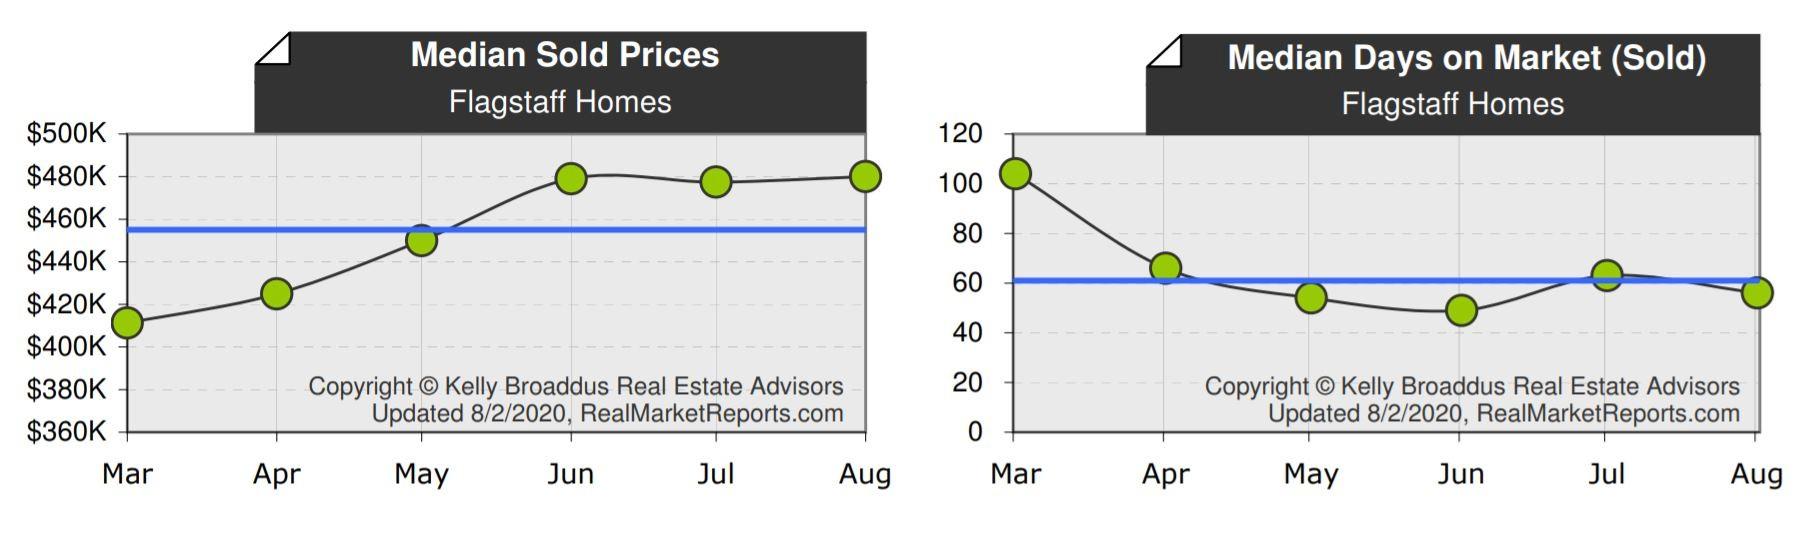 Flagstaff Median Home Price & DOM July 2020